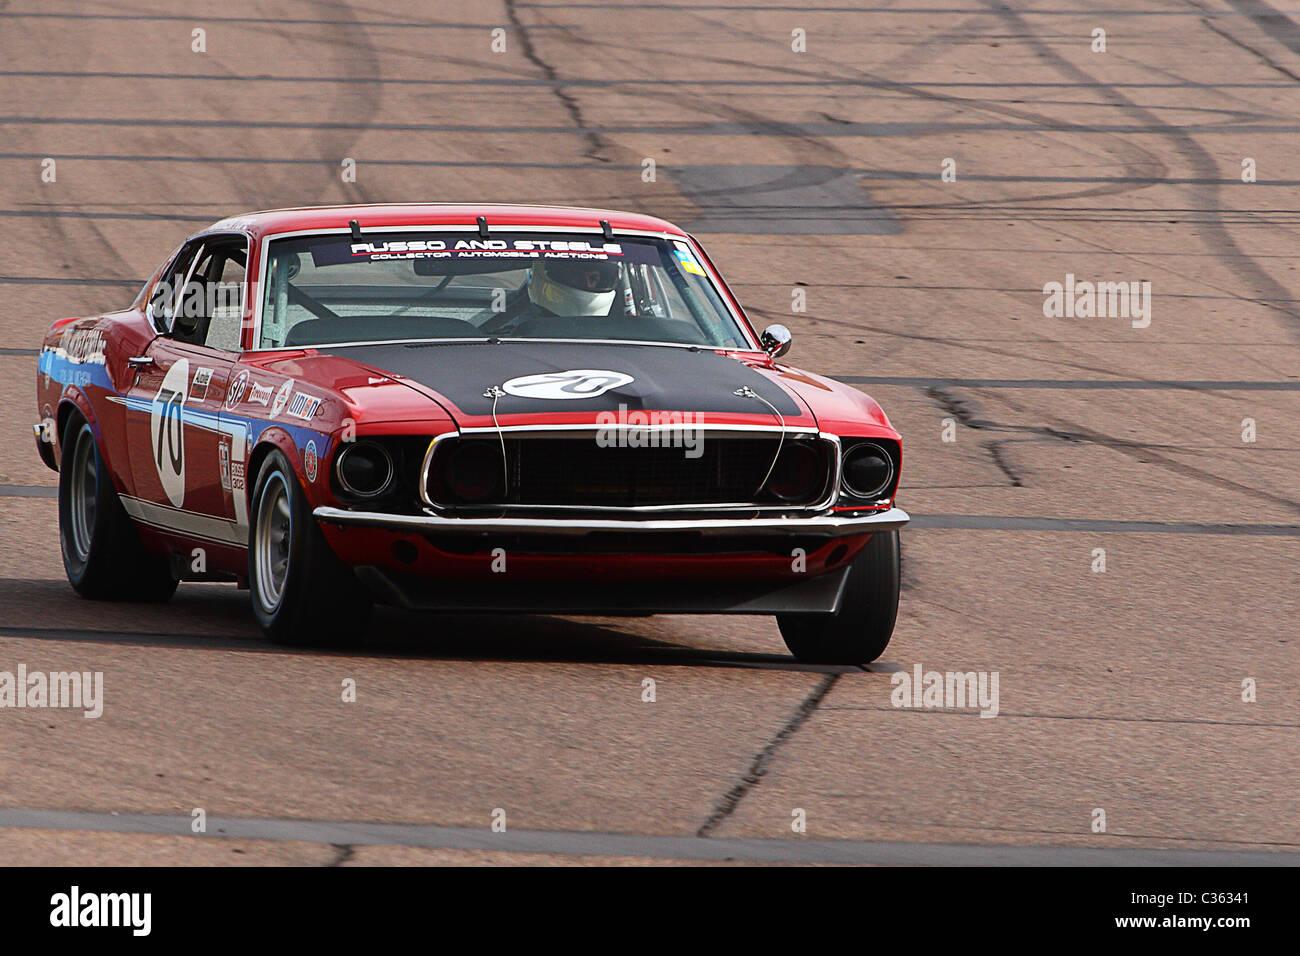 Trans Am Race Car Series Stock Photos & Trans Am Race Car Series ...